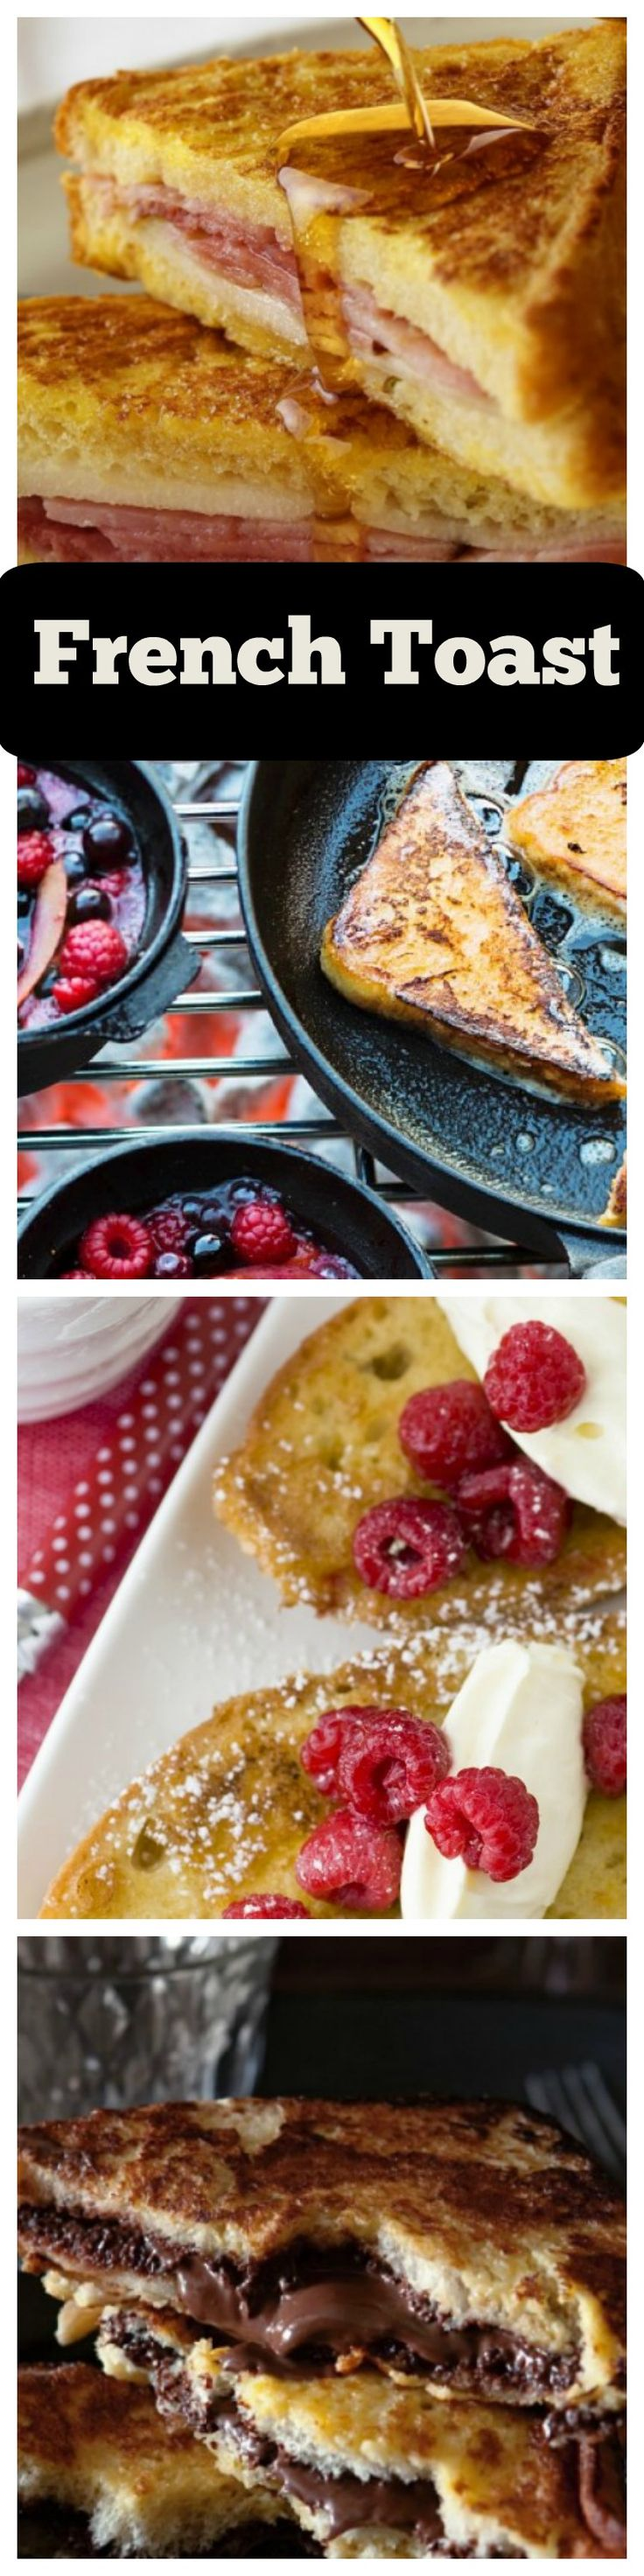 Frühstücksstulle mal anders – leckere French Toast-Rezepte | http://eatsmarter.de/rezepte/rezeptsammlungen/french-toast-fotos#/0